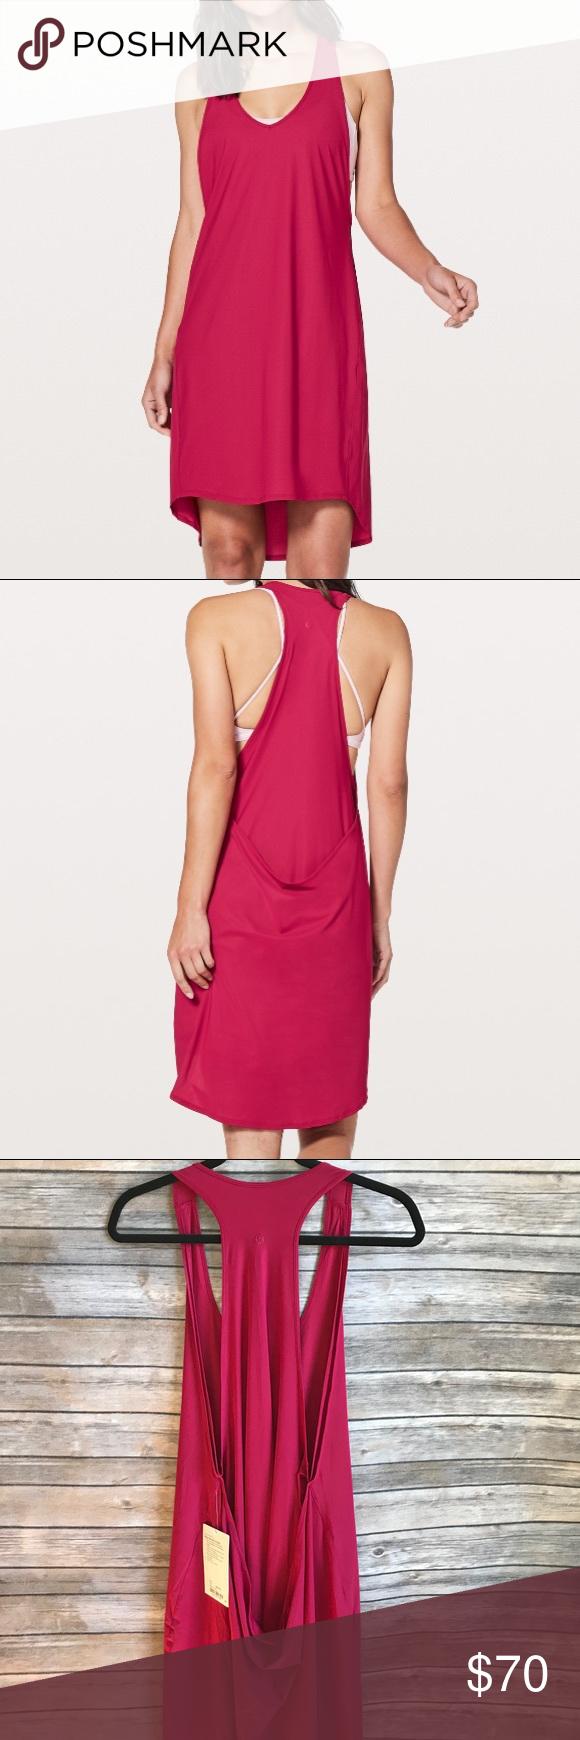 NWT lululemon rejuvenate dress ruby midi dress NWT